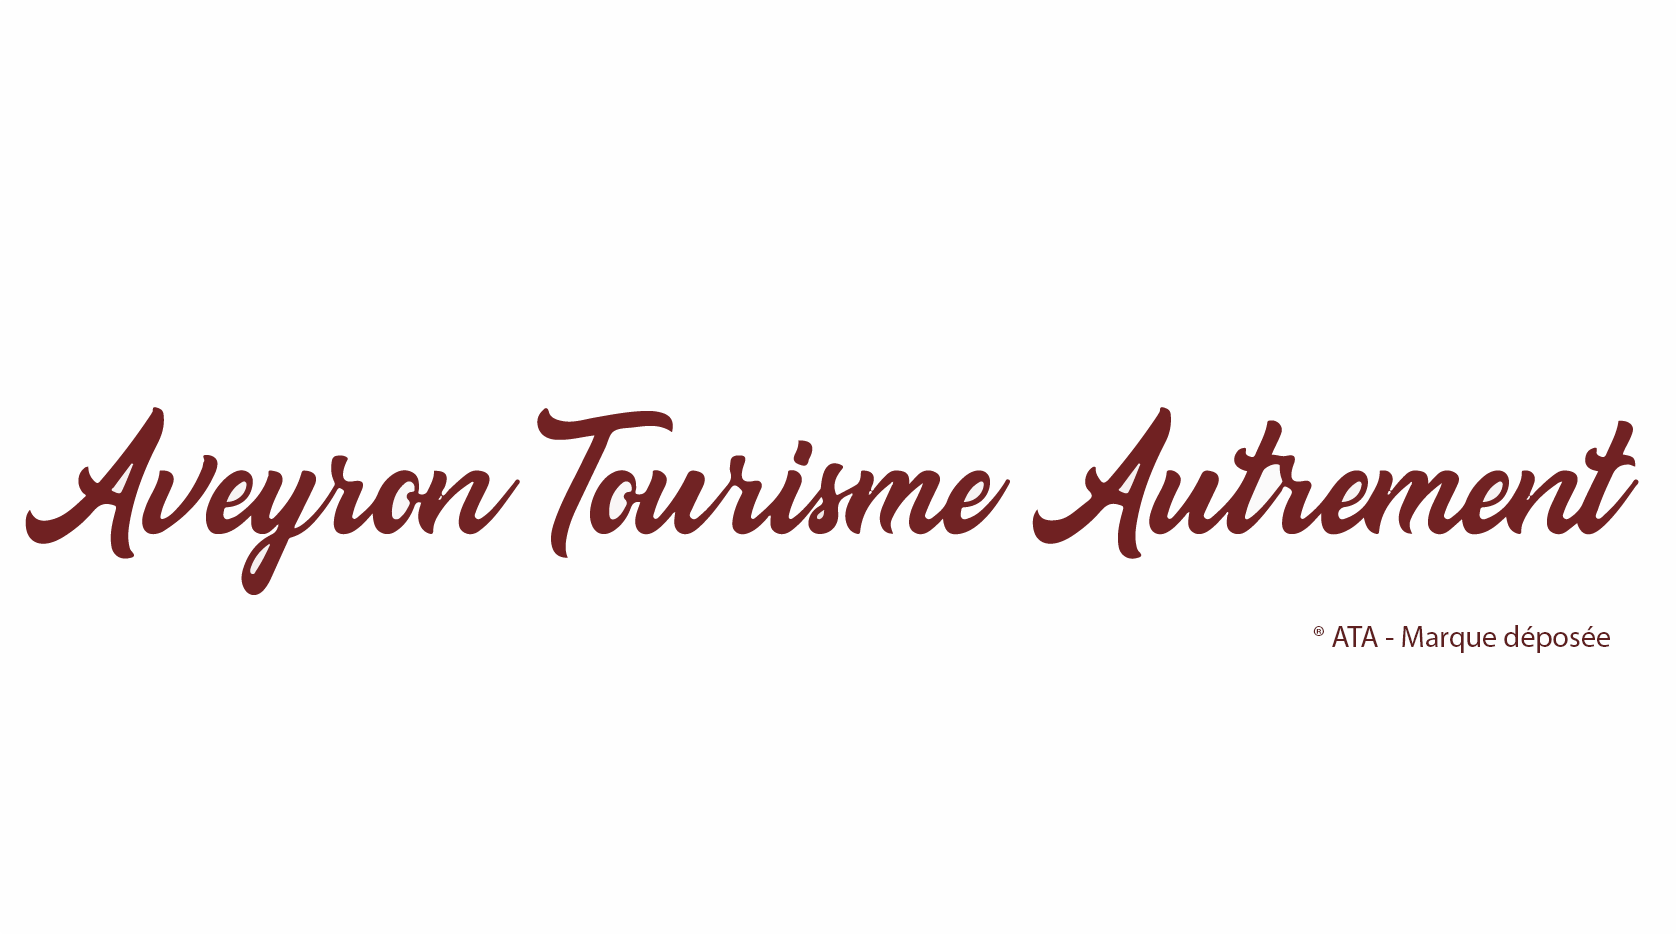 Aveyron Tourisme Autrement